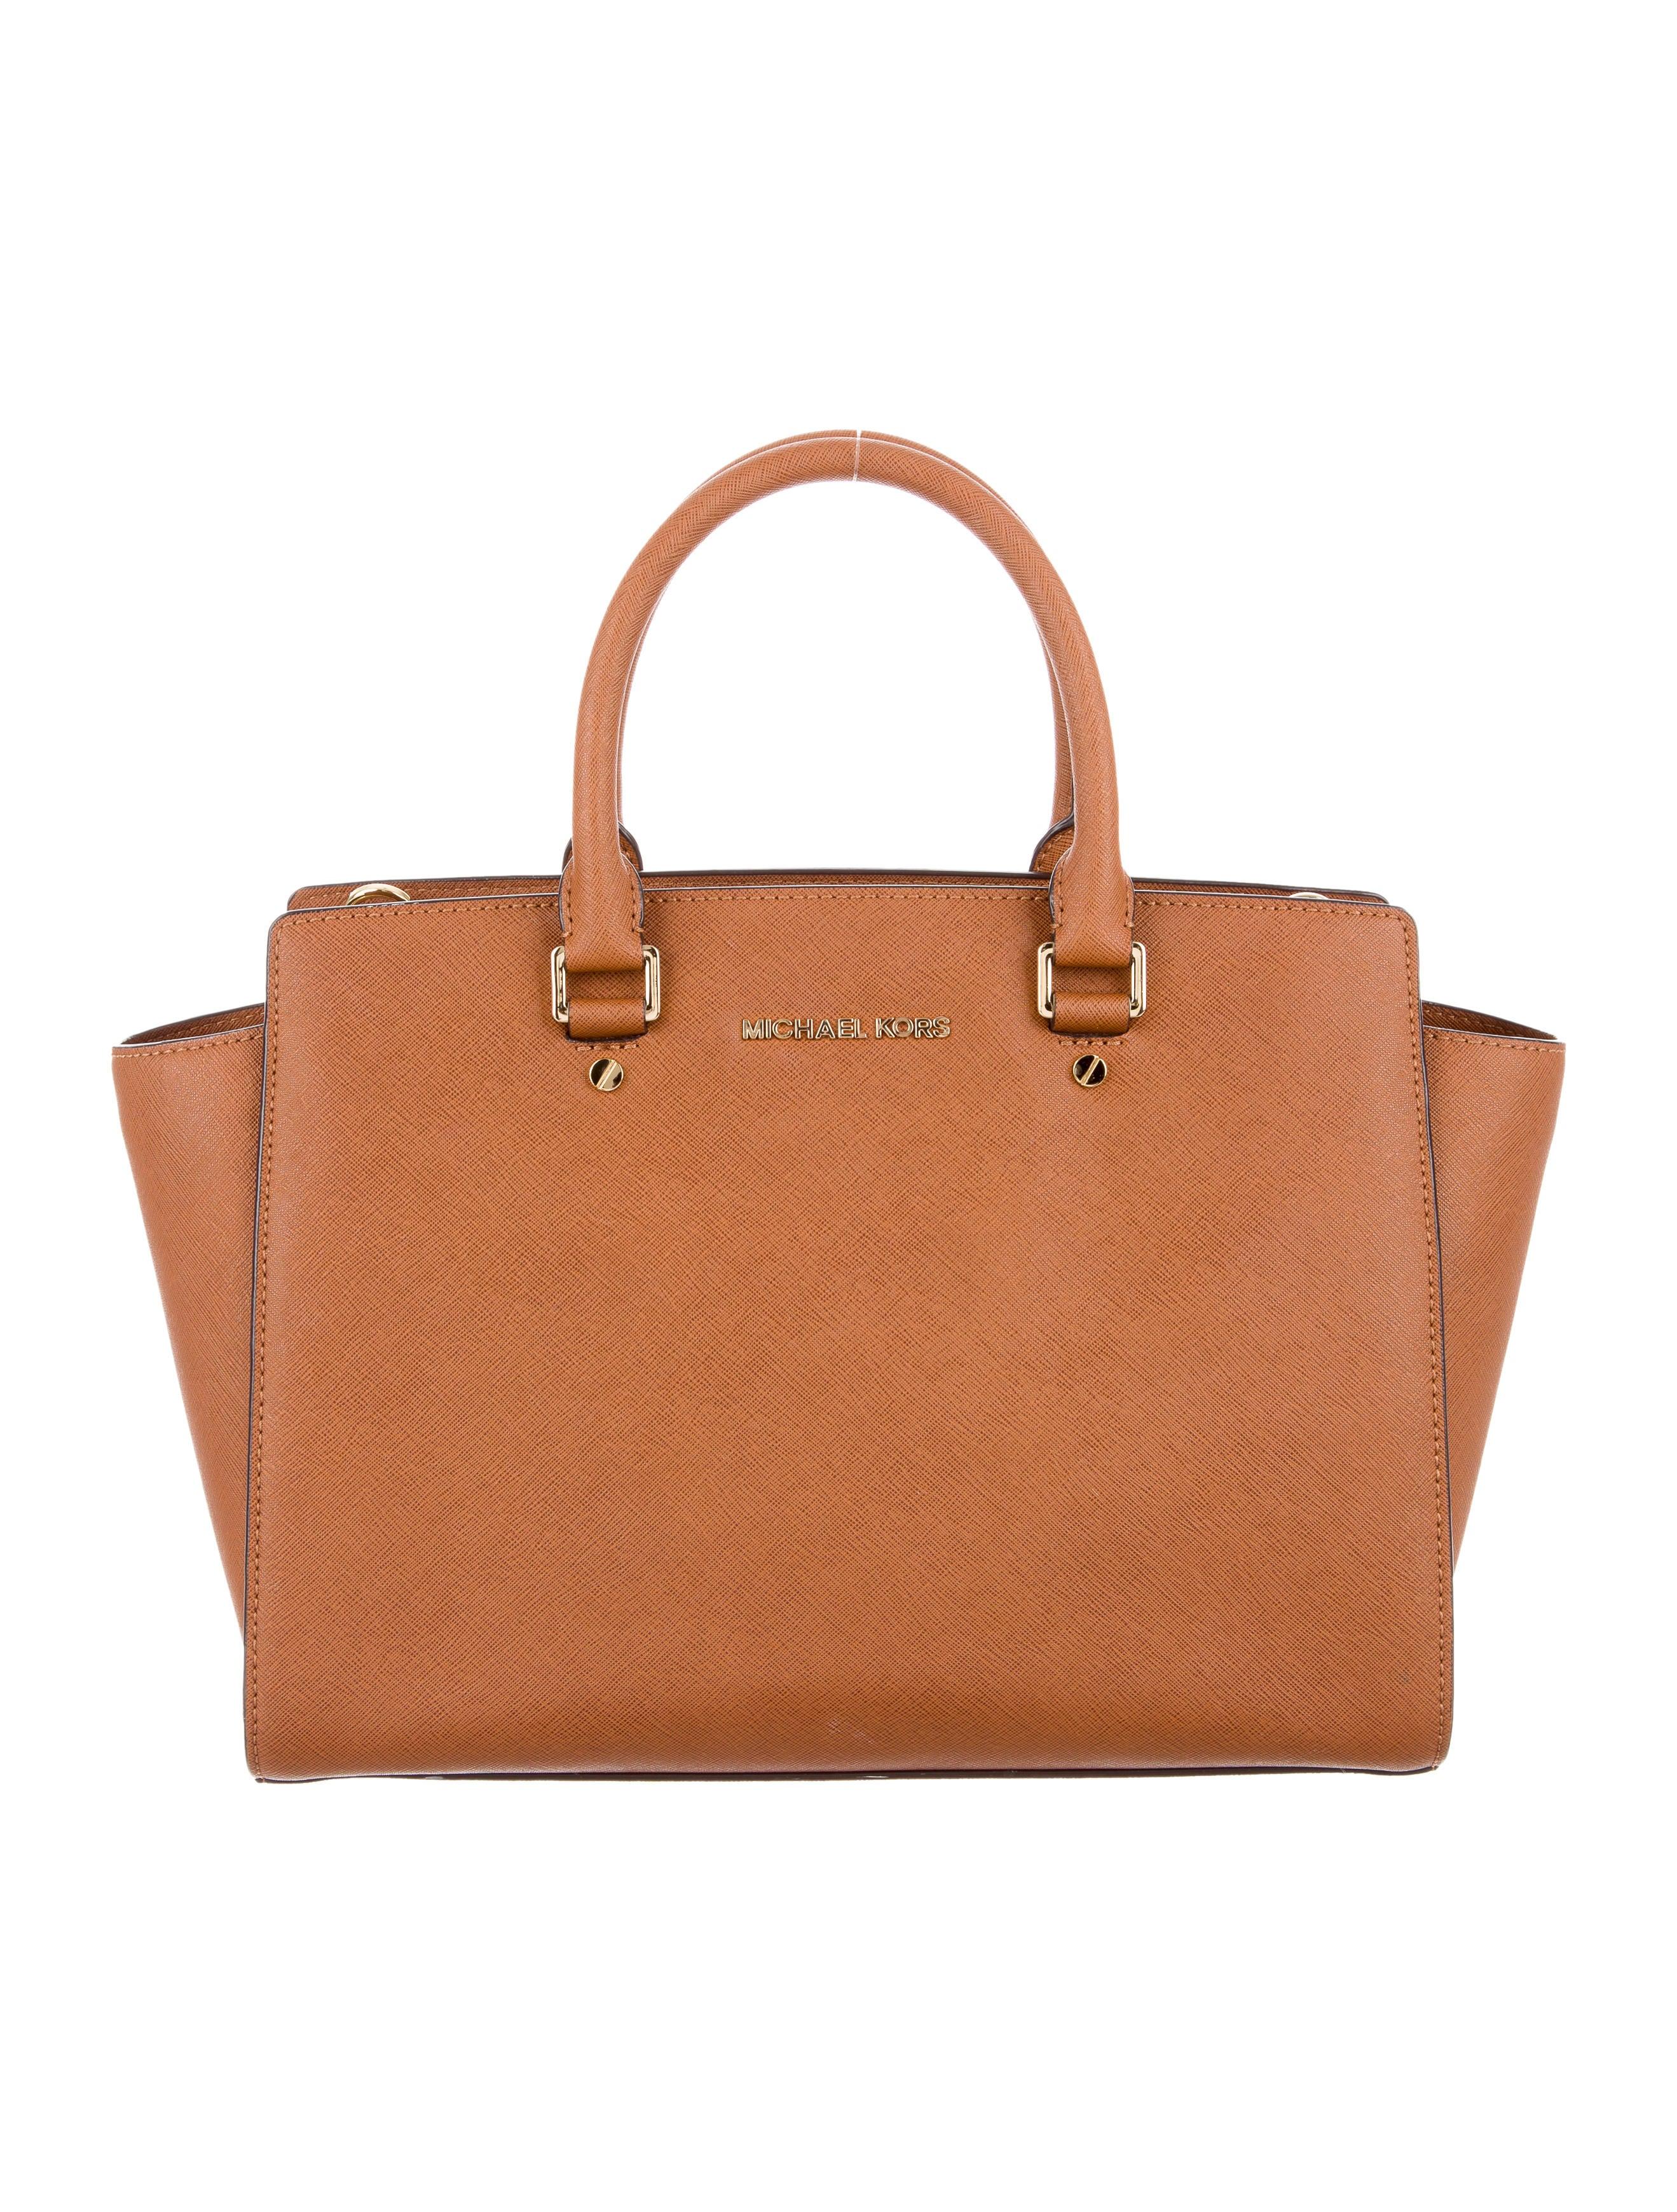 50c970b833e8 Michael Kors Saffiano Handbags | Stanford Center for Opportunity ...